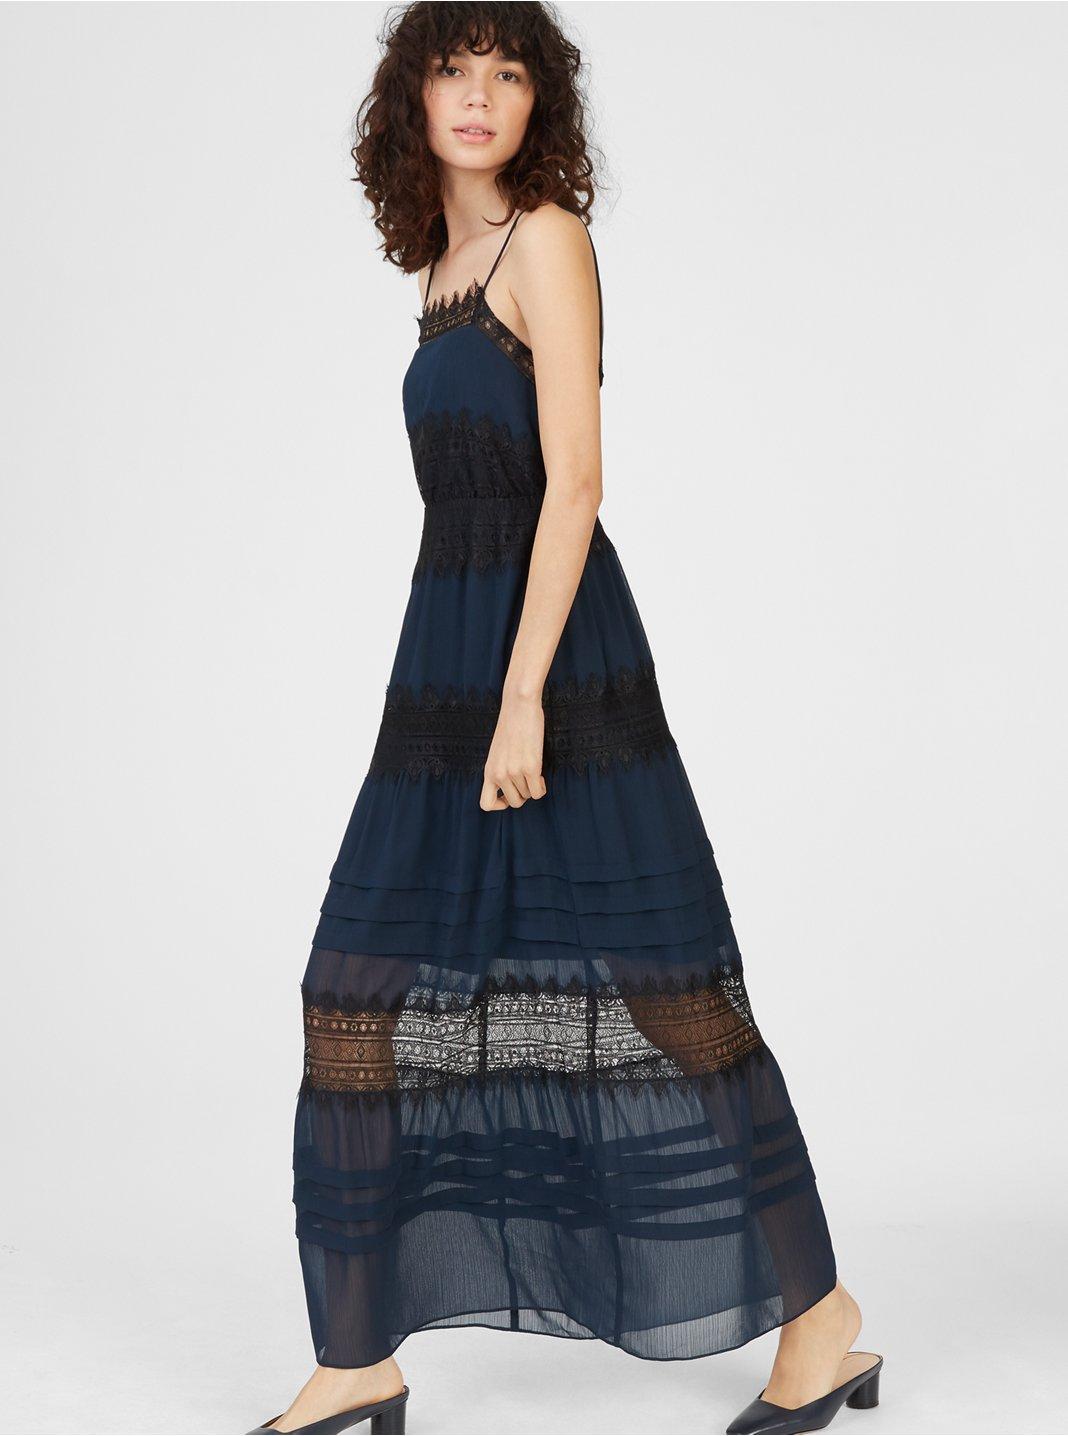 Galadreyel Dress